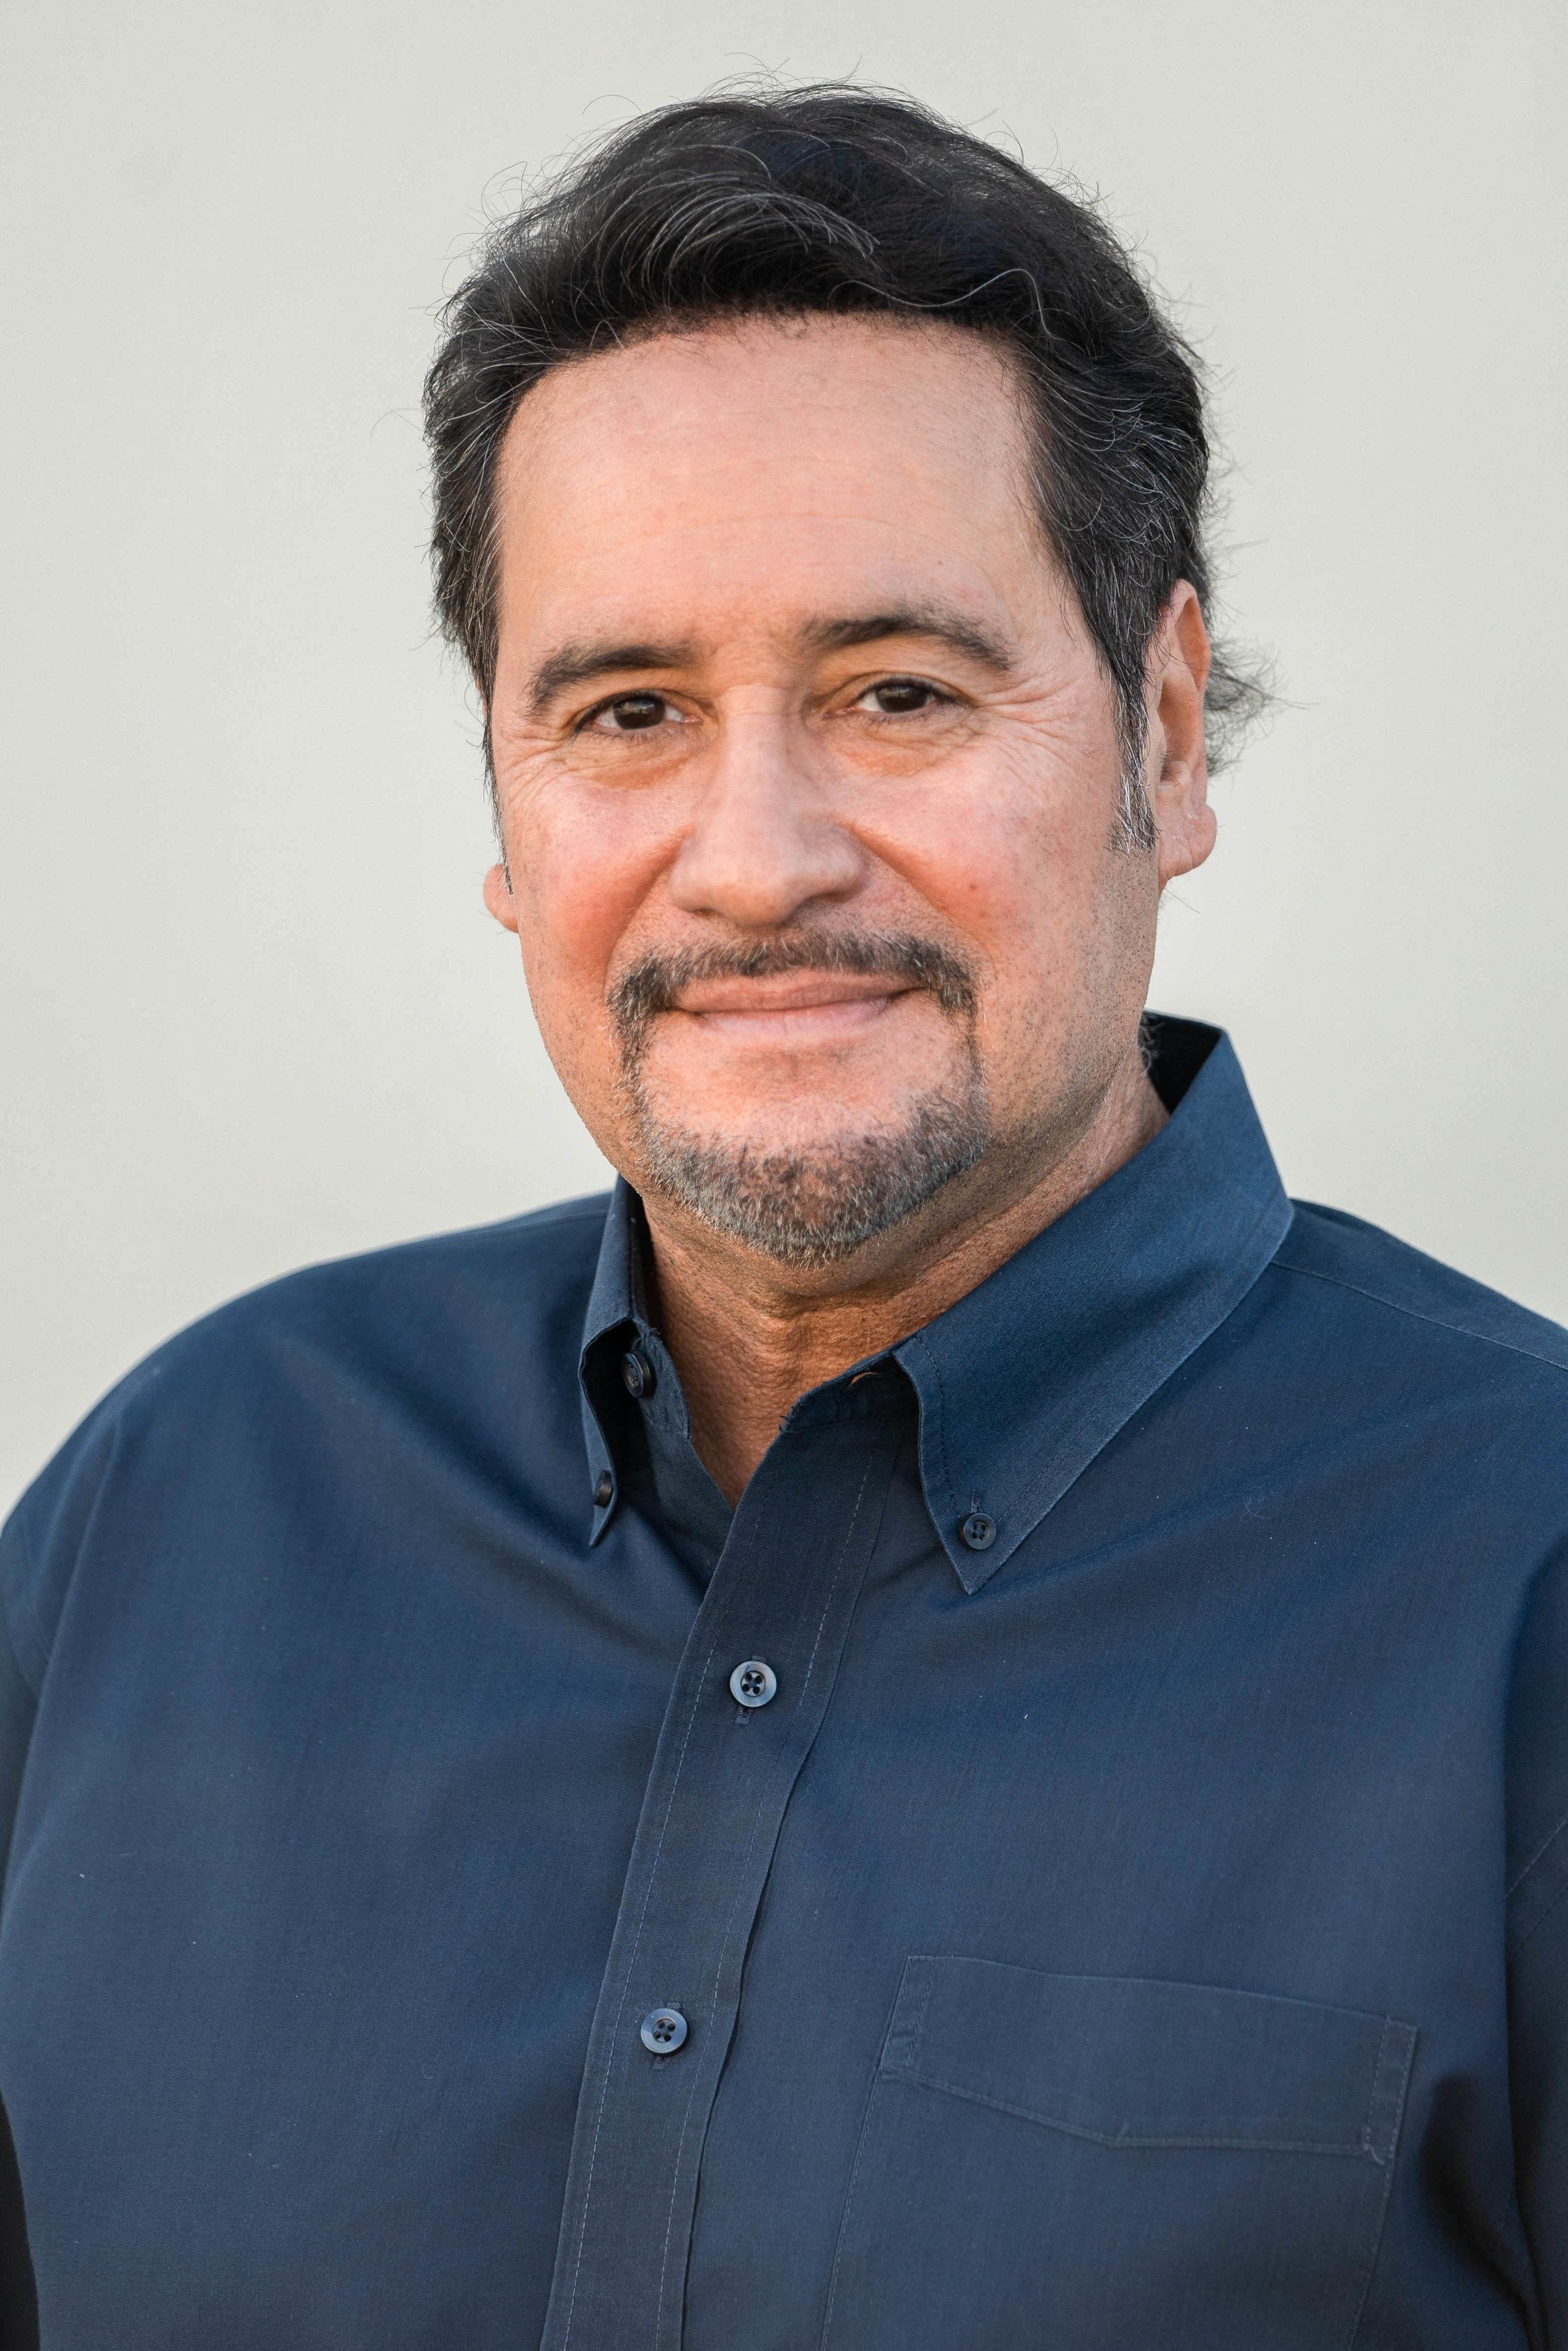 Tony Gonzales - Principal916-245-4234 - Direct916-220-5459 - Celltony@icongc.com